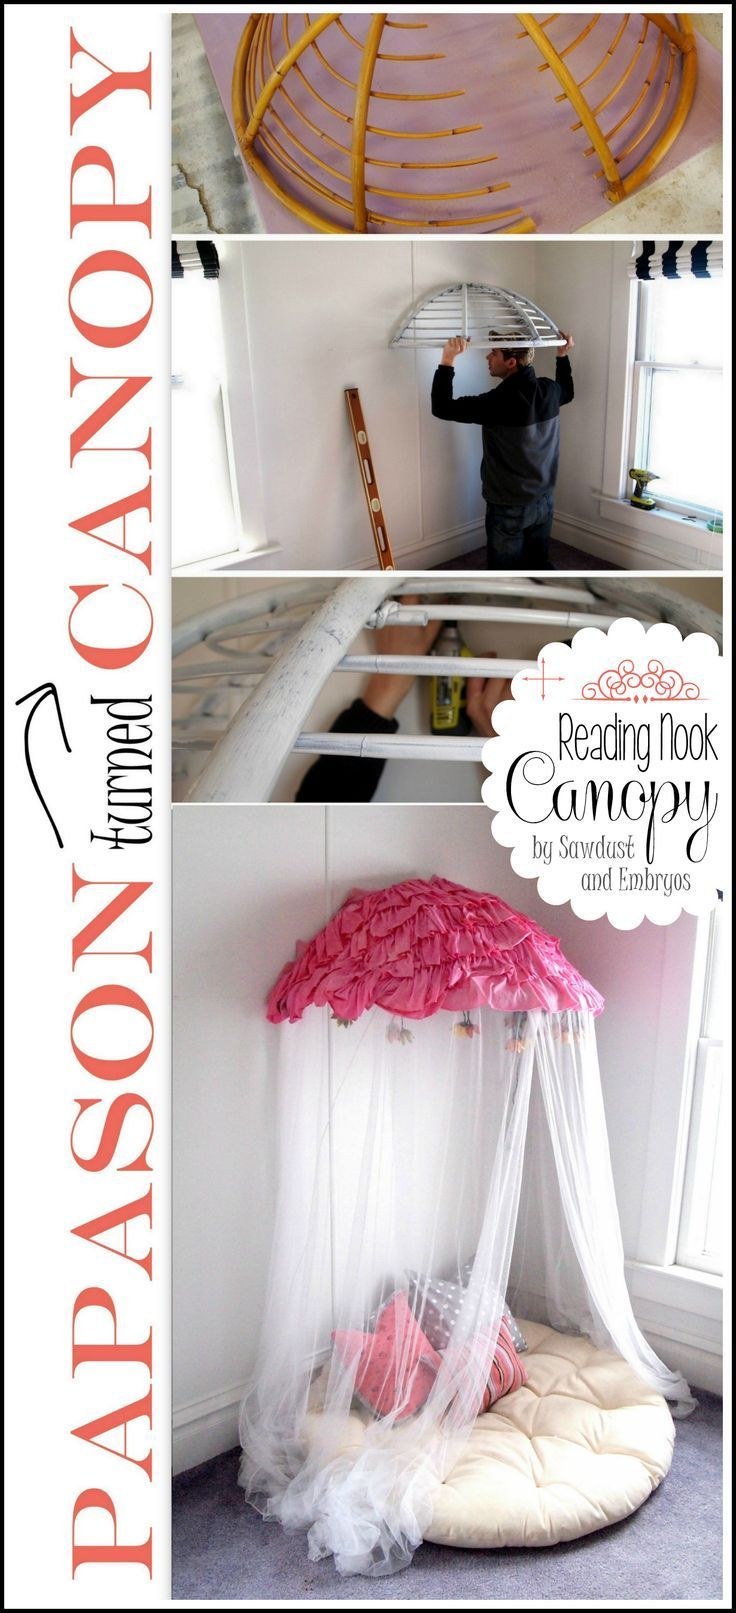 Homemade Bed Canopy Best 25 Homemade Canopy Ideas On Pinterest Hula Hoop Canopy